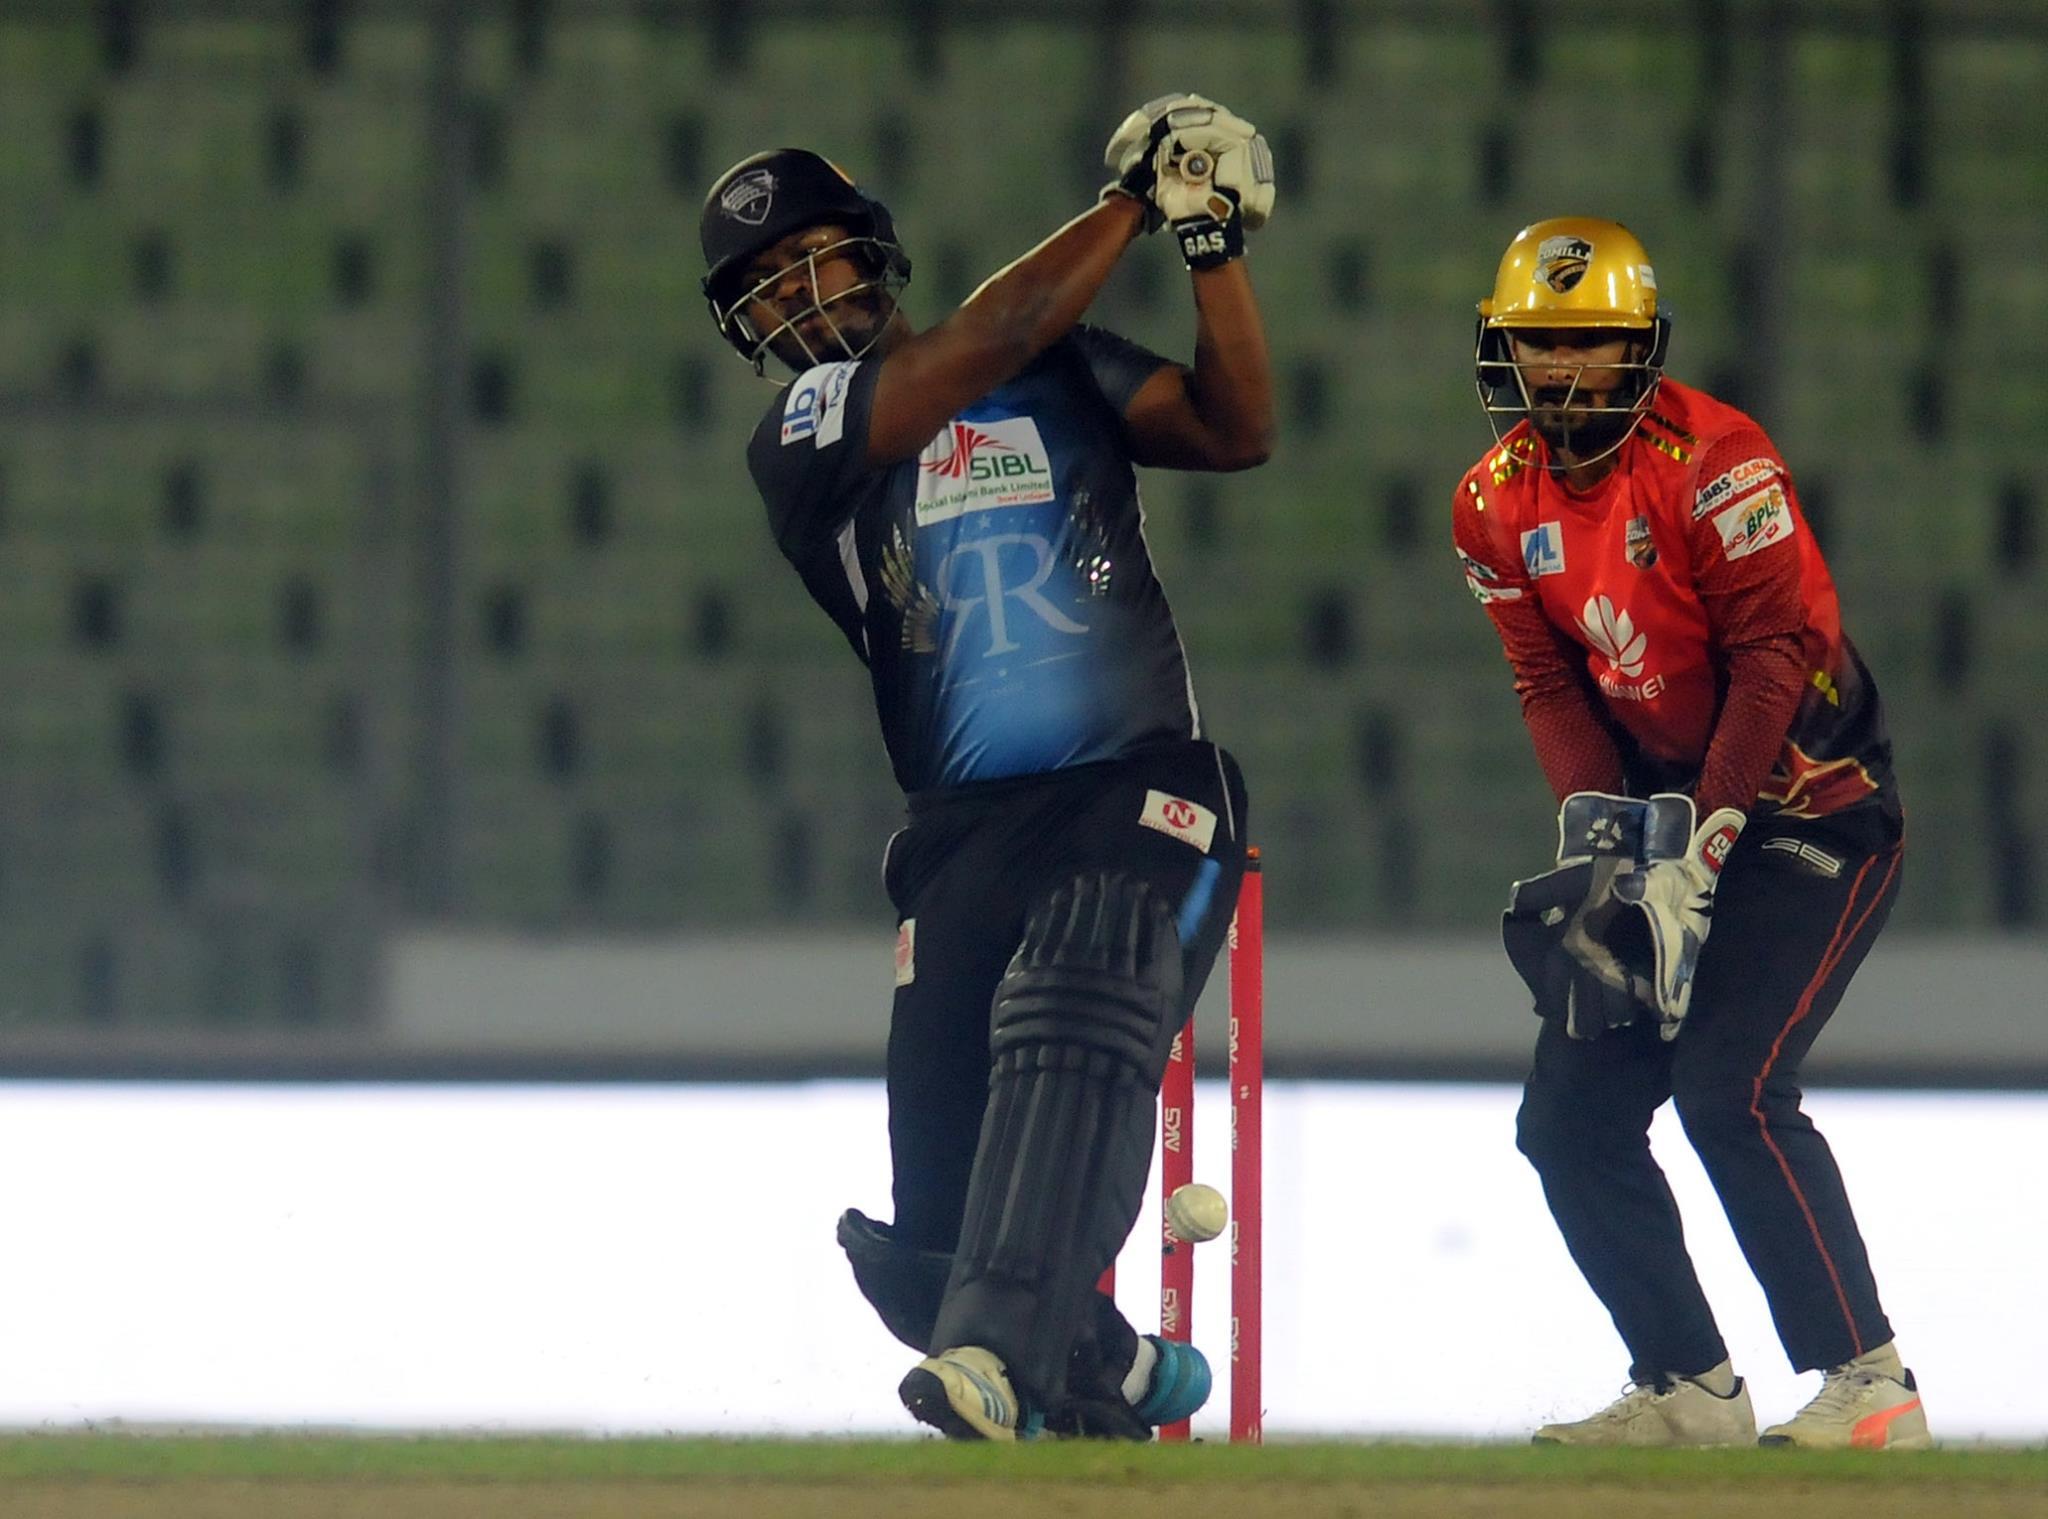 Charles unbeaten 105, McCullum 78 power Rangpur to 192